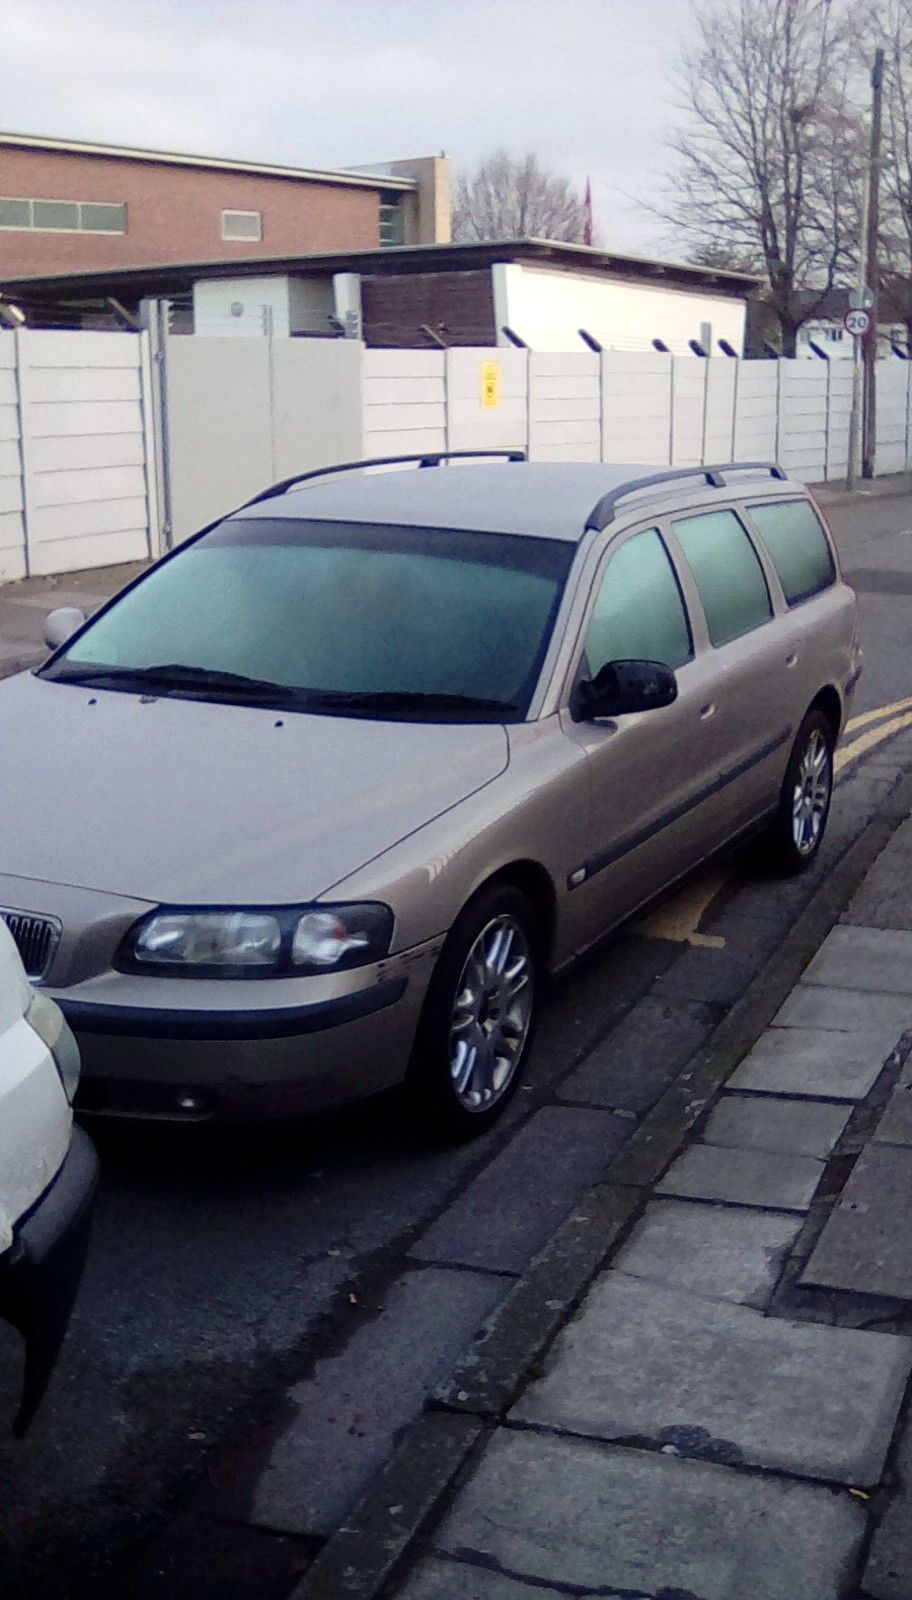 eBay: Volvo v70 t5 spares or repairs damaged salvage #carparts ...